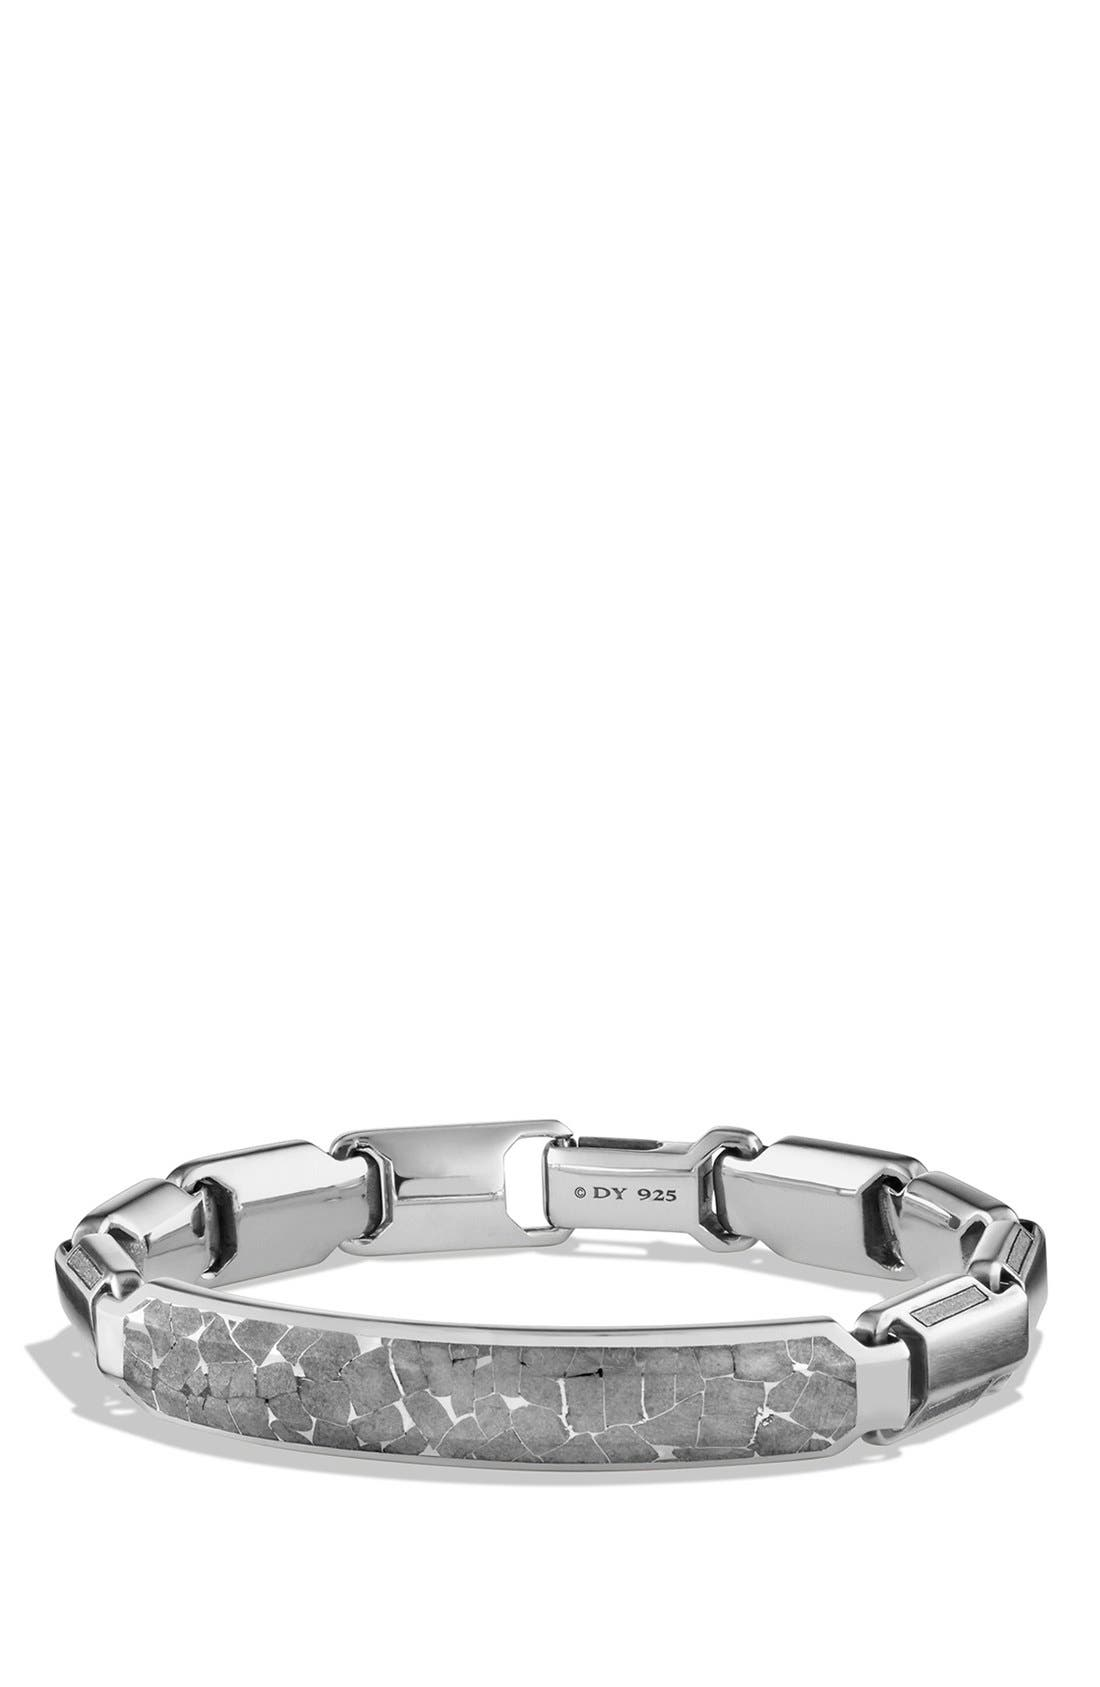 David Yurman 'Meteorite' Fused ID Bracelet